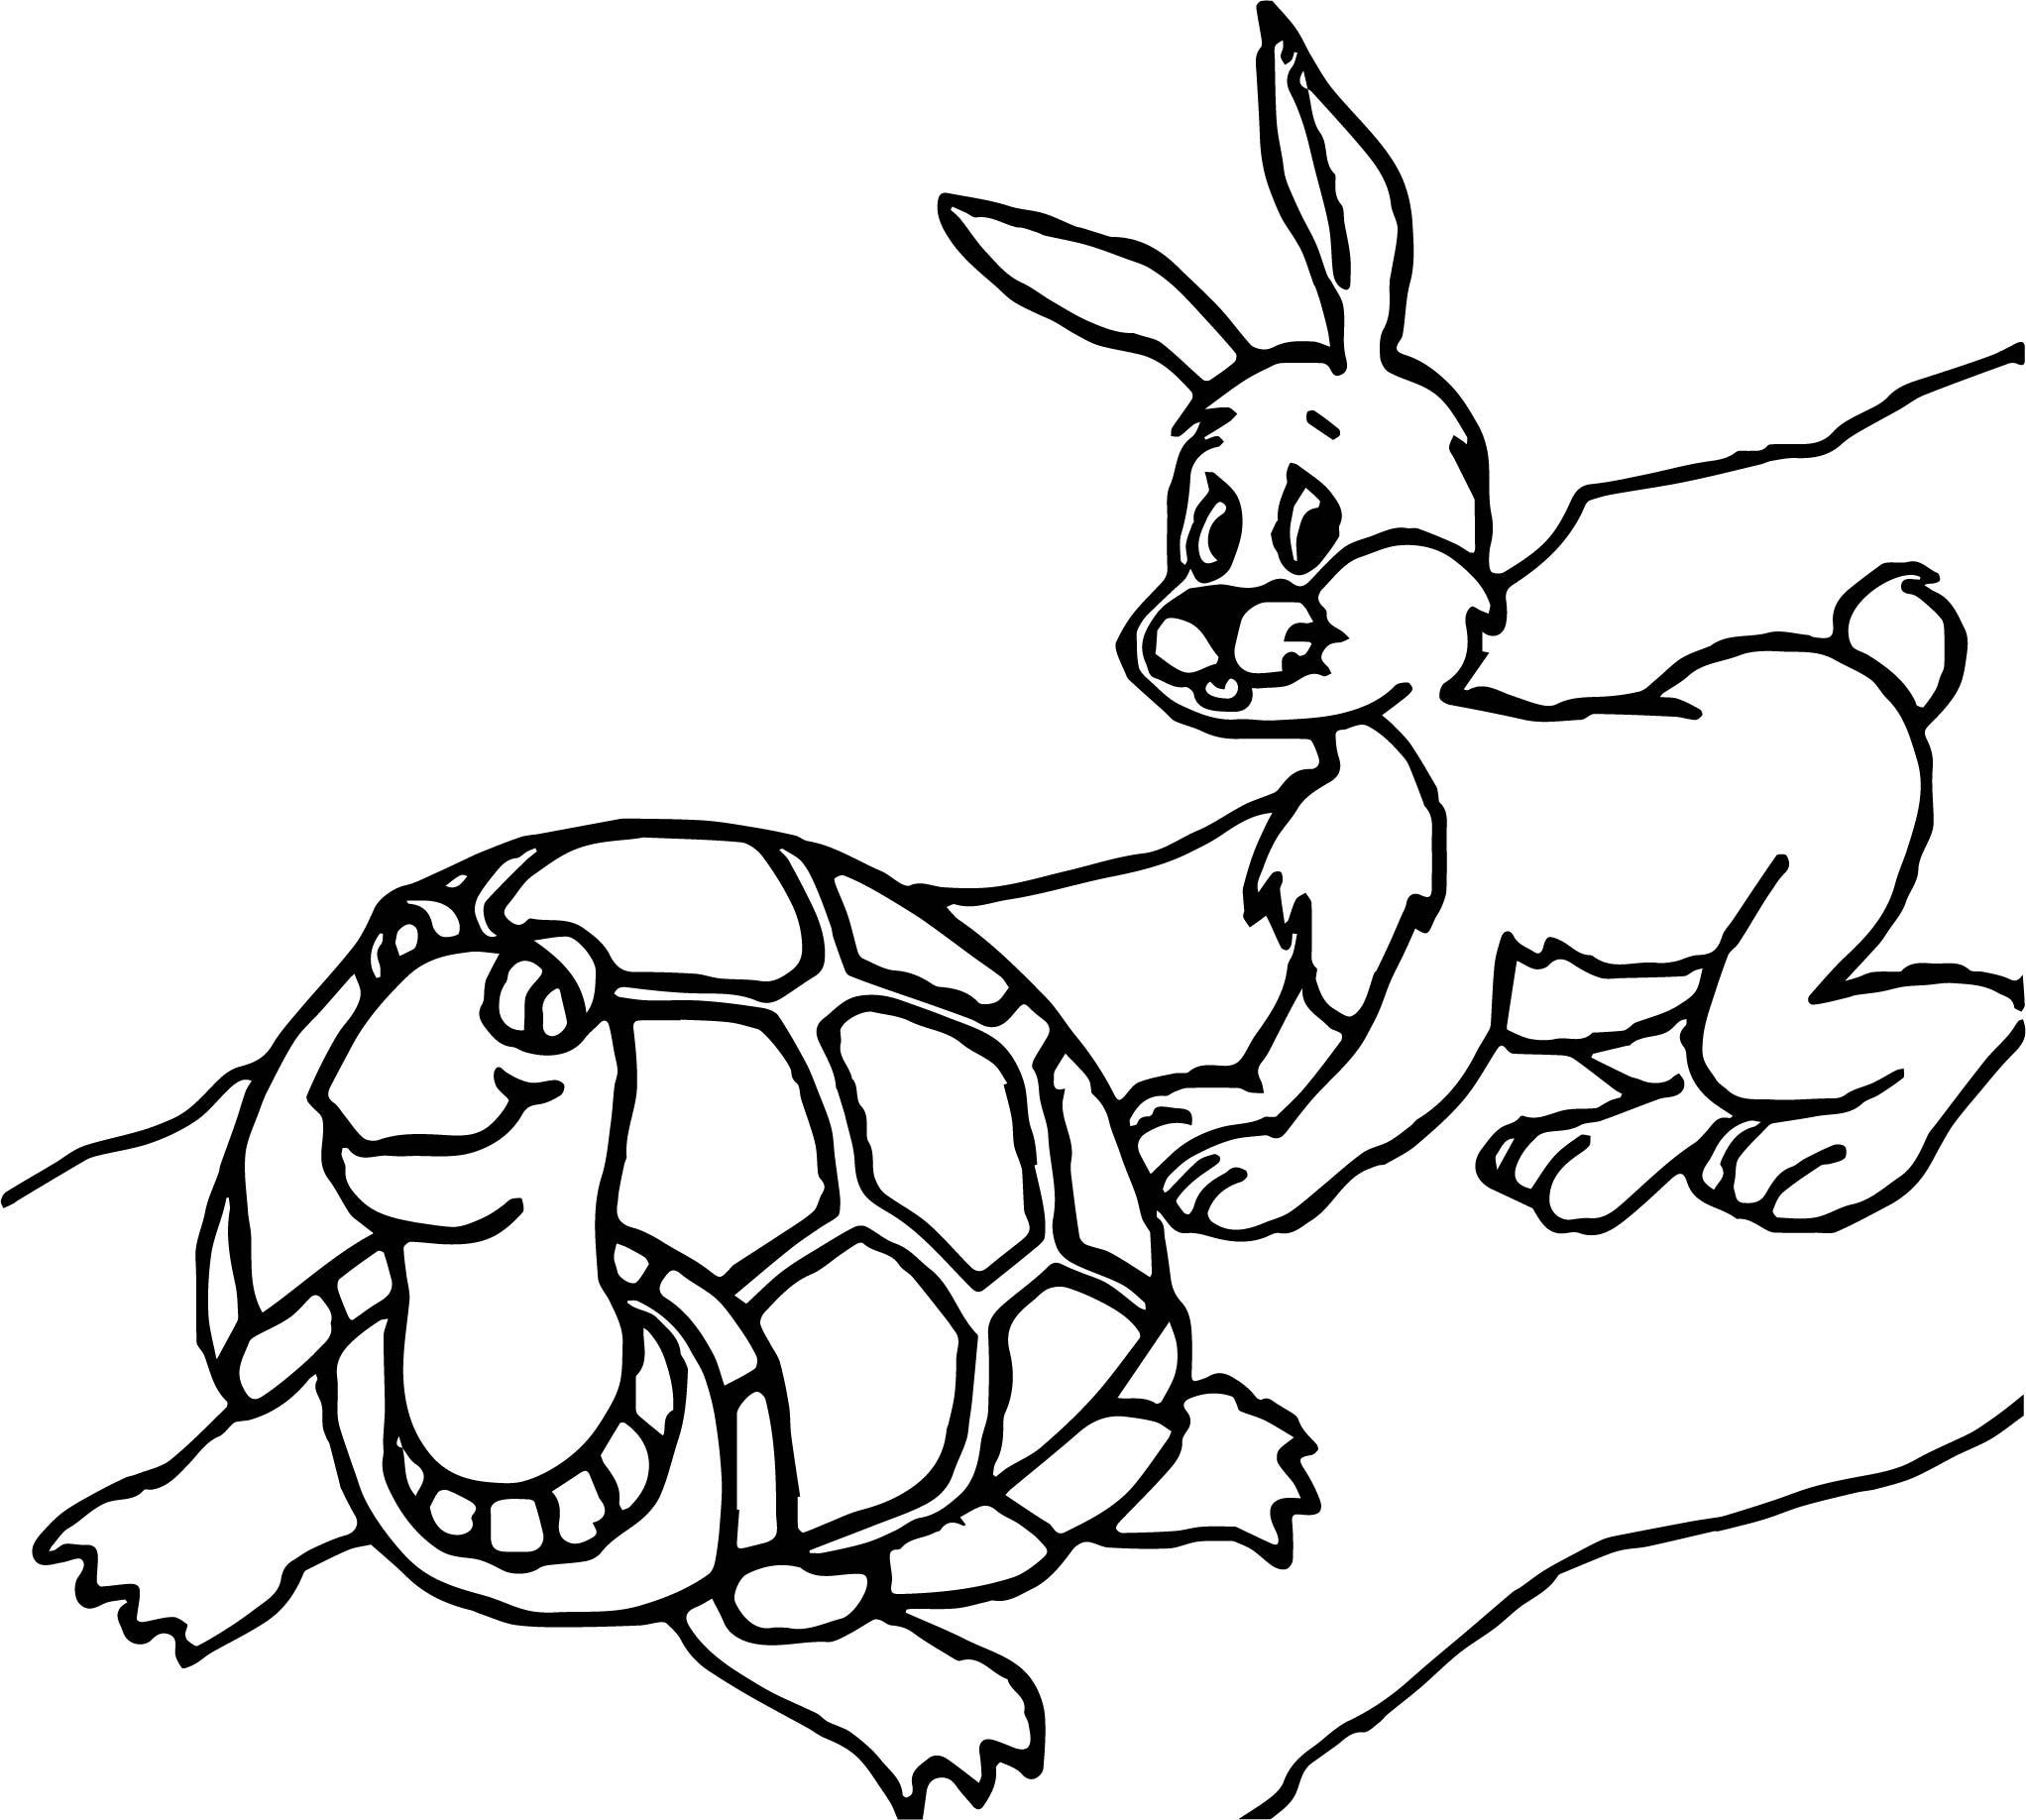 Tortoise Turtle Bunny Coloring PageTortoise Turtle Bunny Coloring Page